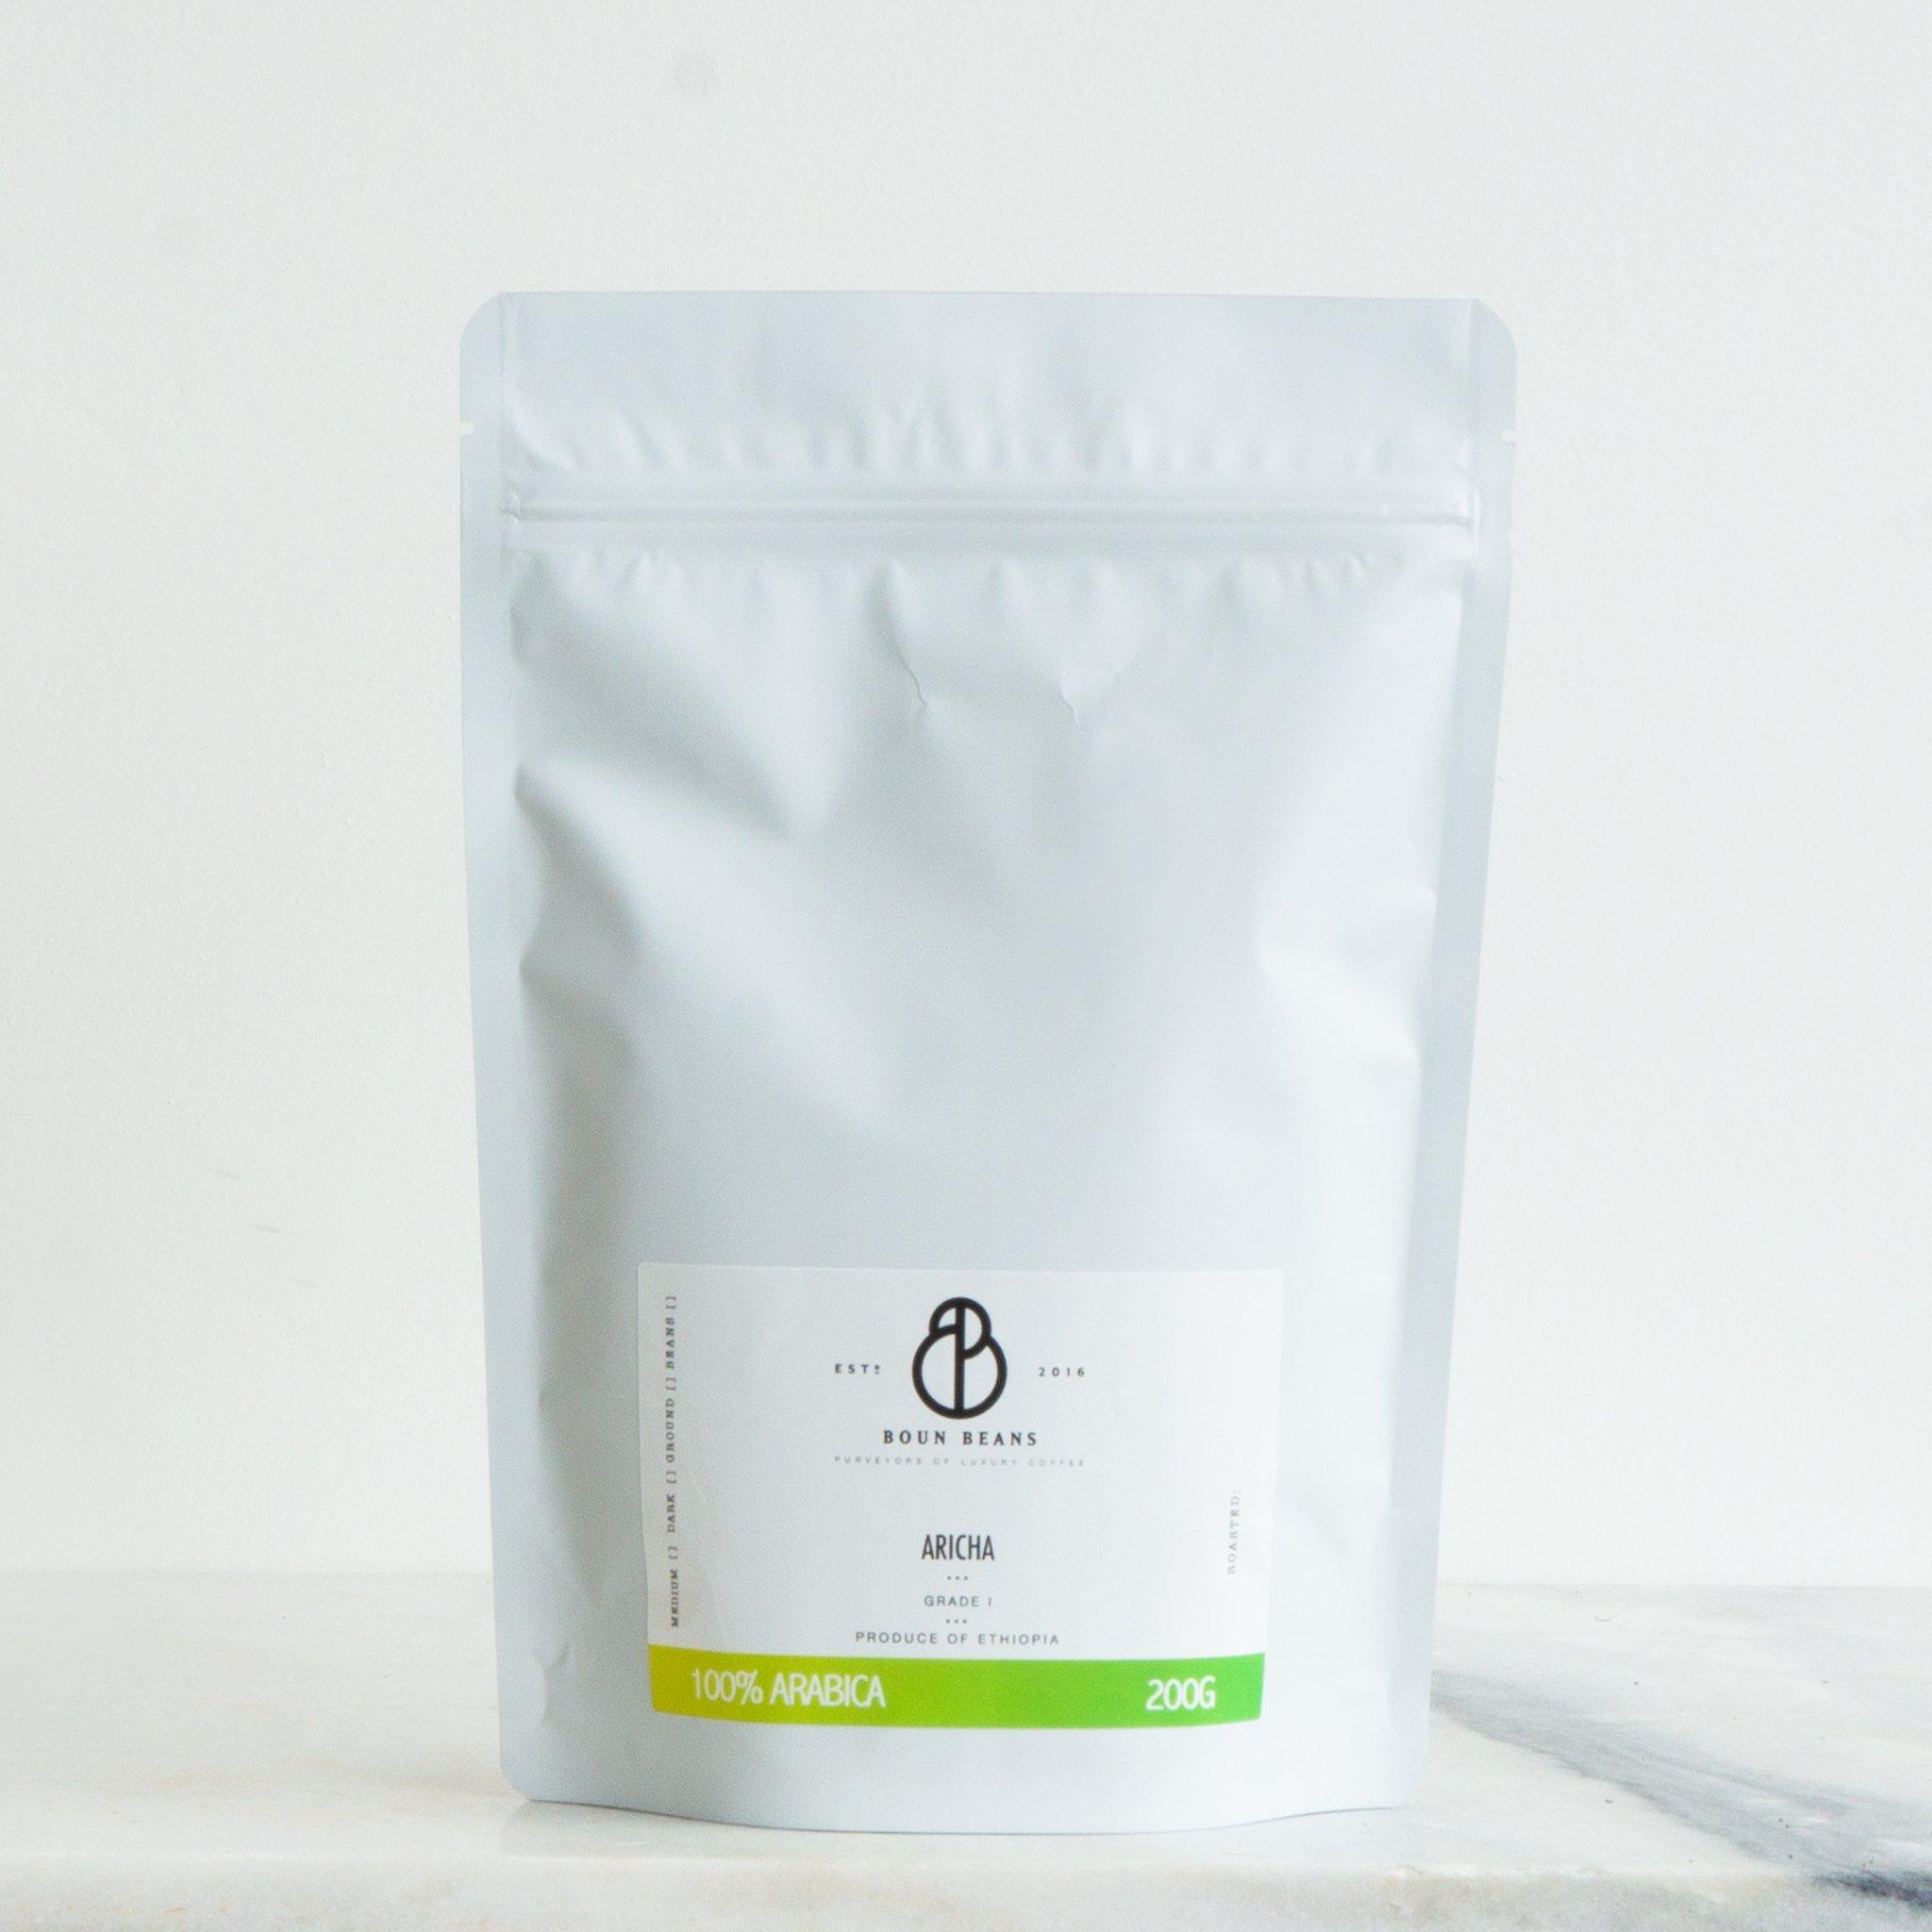 Ethiopian Coffee Aricha Grade 1 Buy Coffee Online Bespoke Roasts Free Delivery